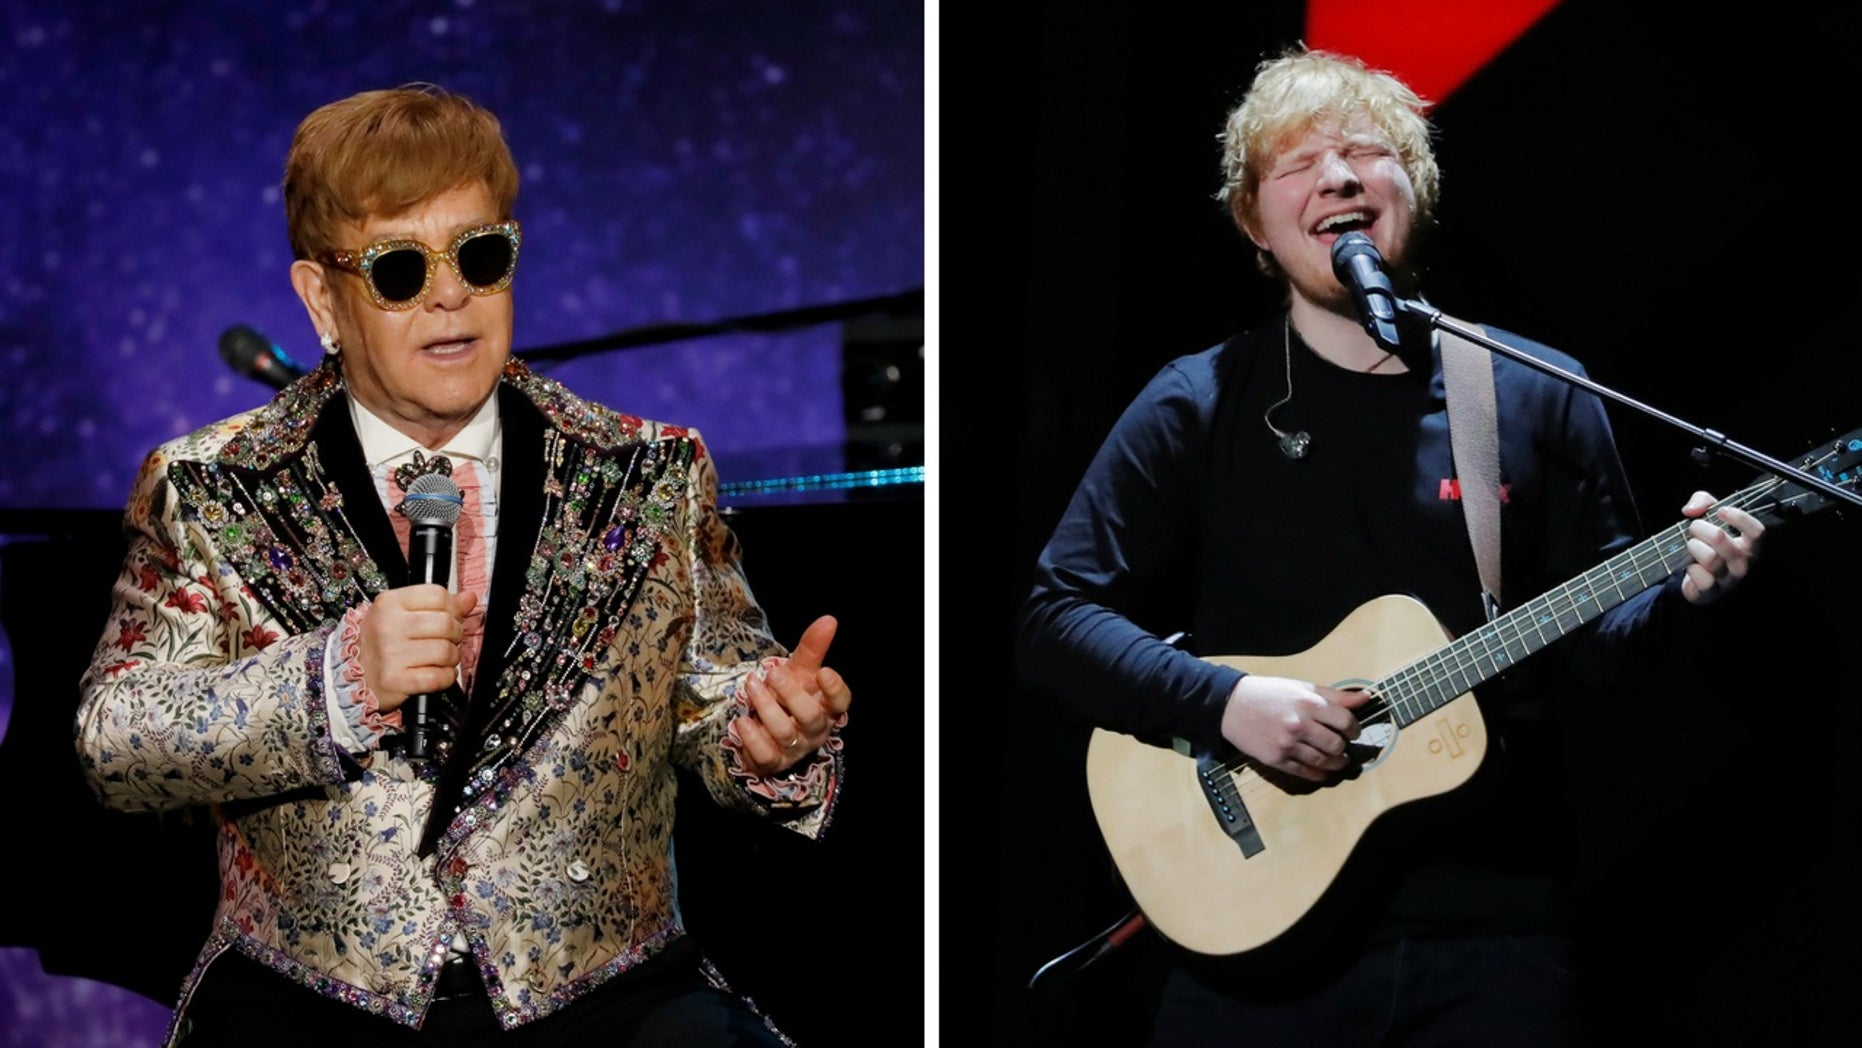 Elton John said he warned Ed Sheeran his popularity would not last forever.